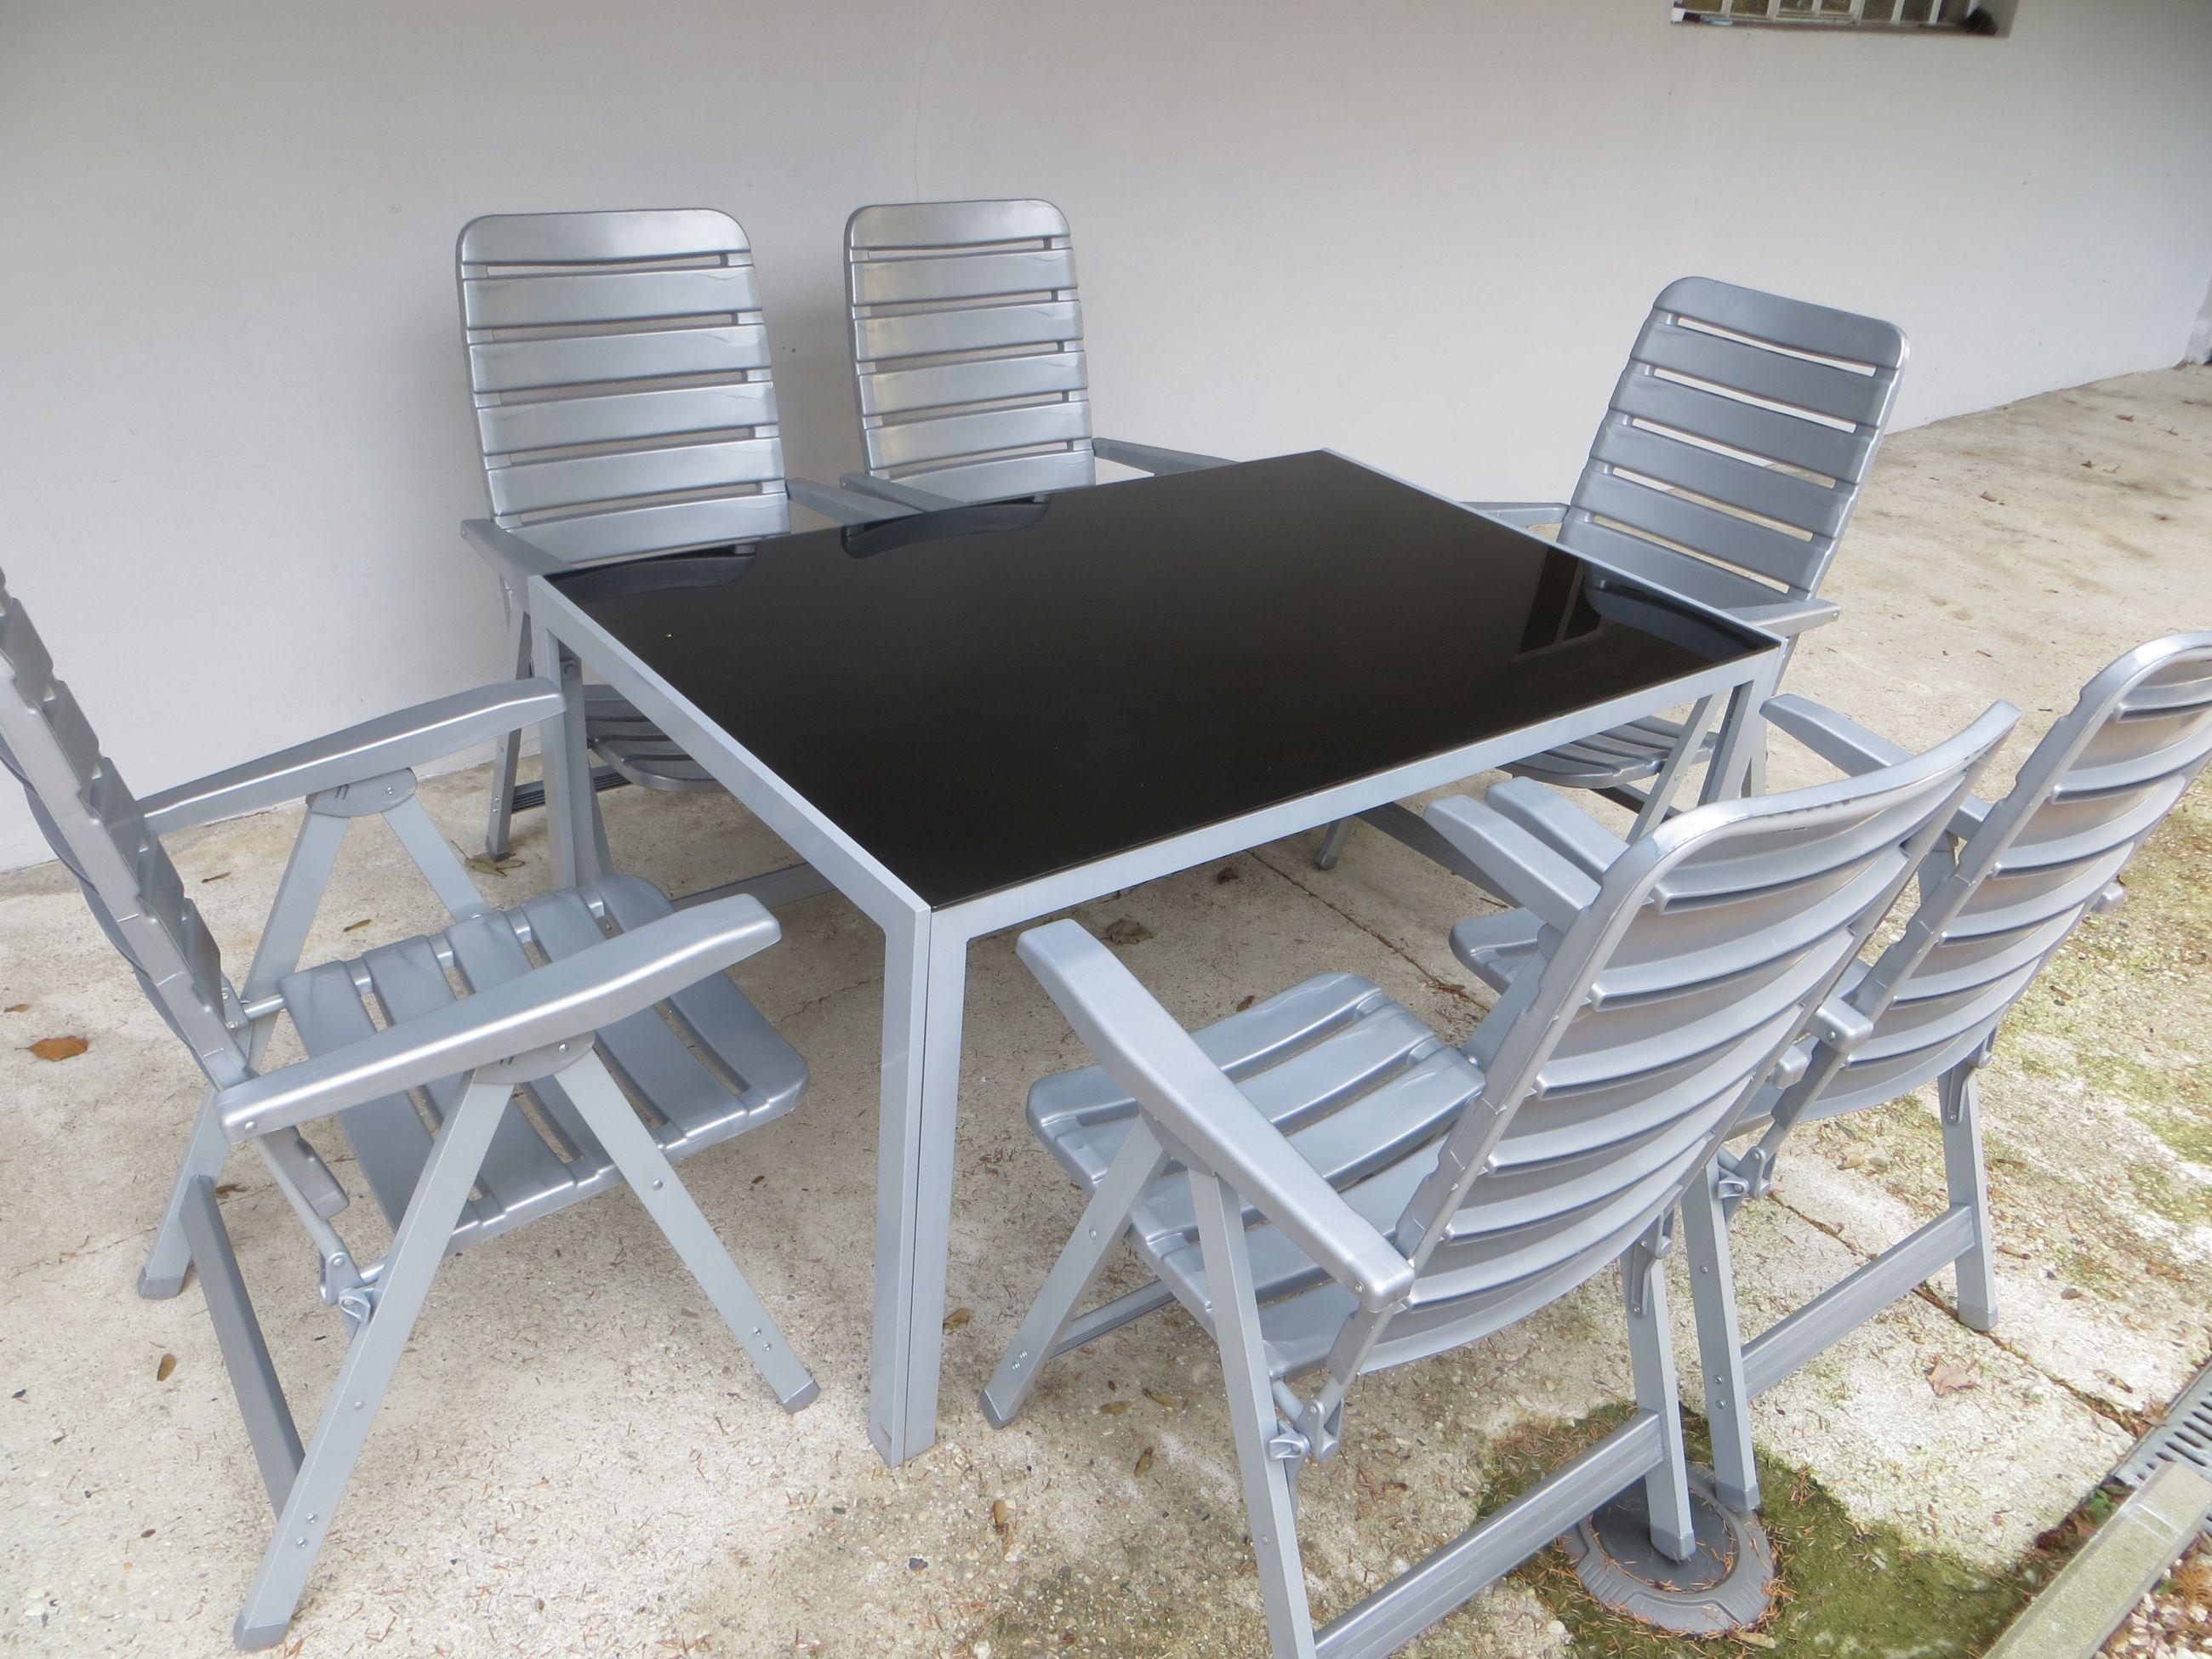 rio alu gartenm bel set sitzgarnitur 7 teilig silber gartenm bel gruppen garten. Black Bedroom Furniture Sets. Home Design Ideas